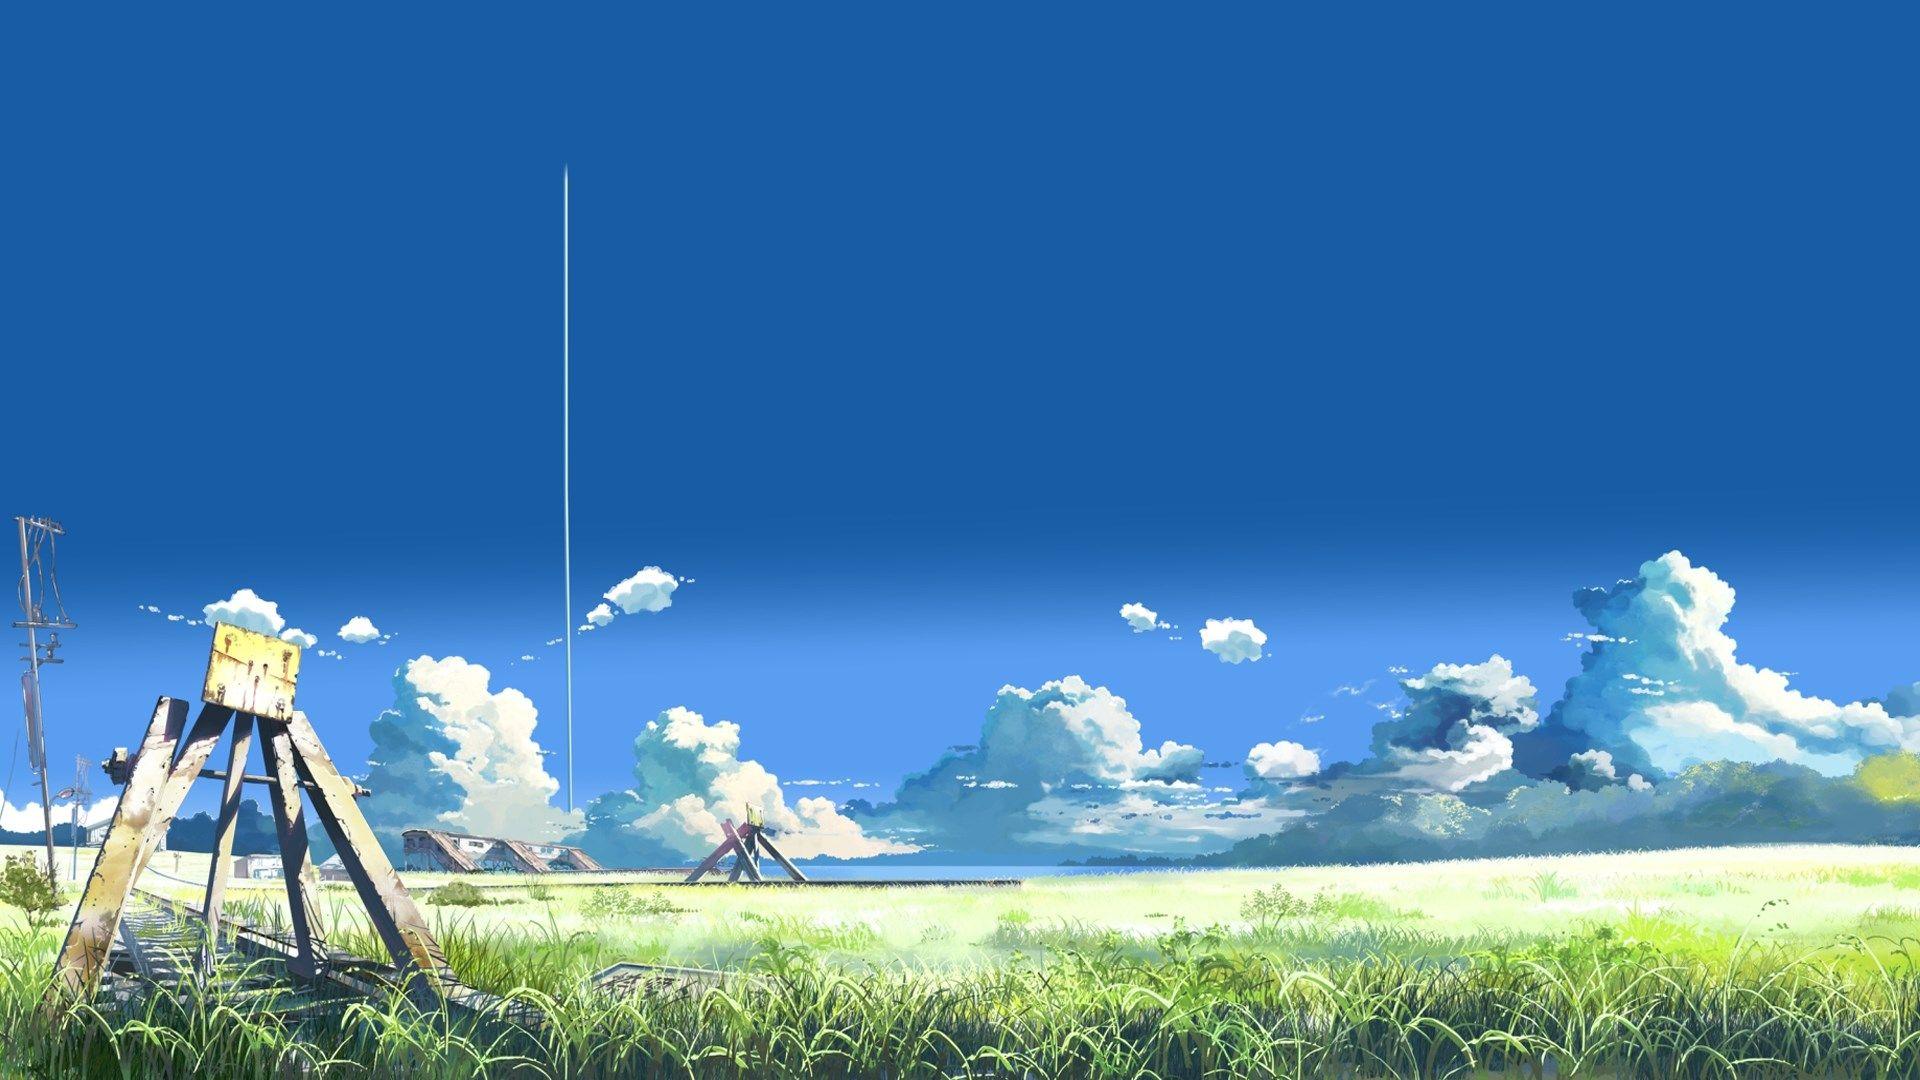 anime Wallpaper Collection 1920x1080 草原 イラスト, 風景の絵